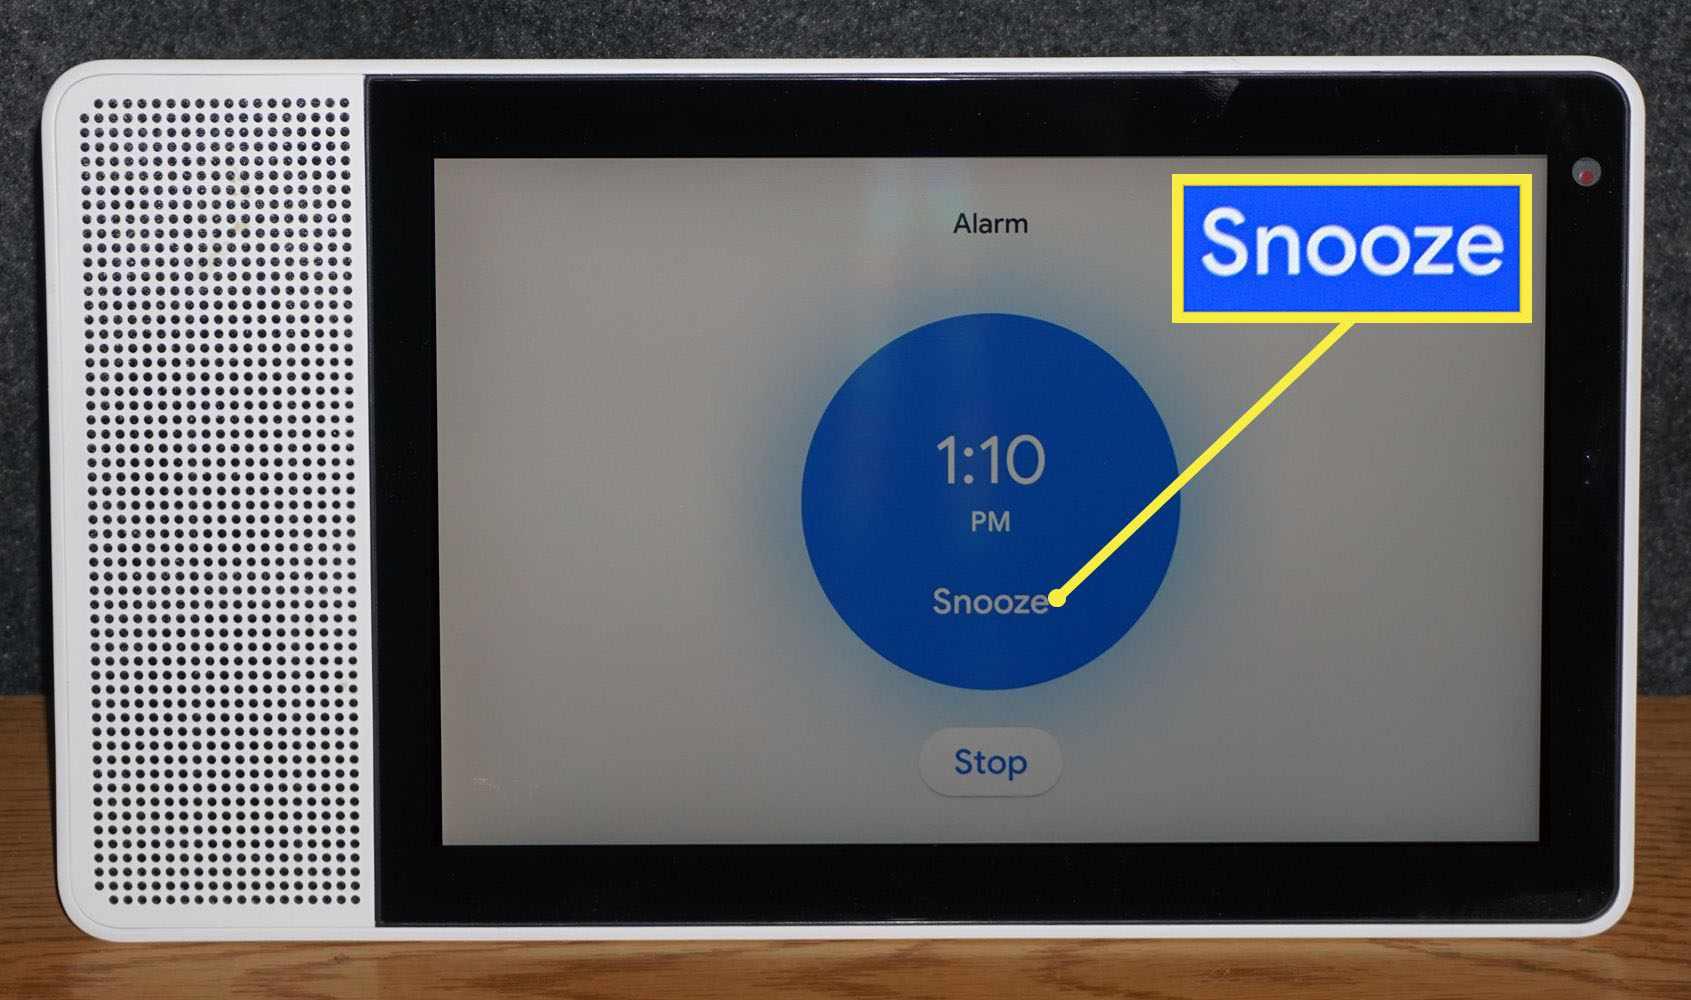 Snooze Prompt on Lenovo Smart Display